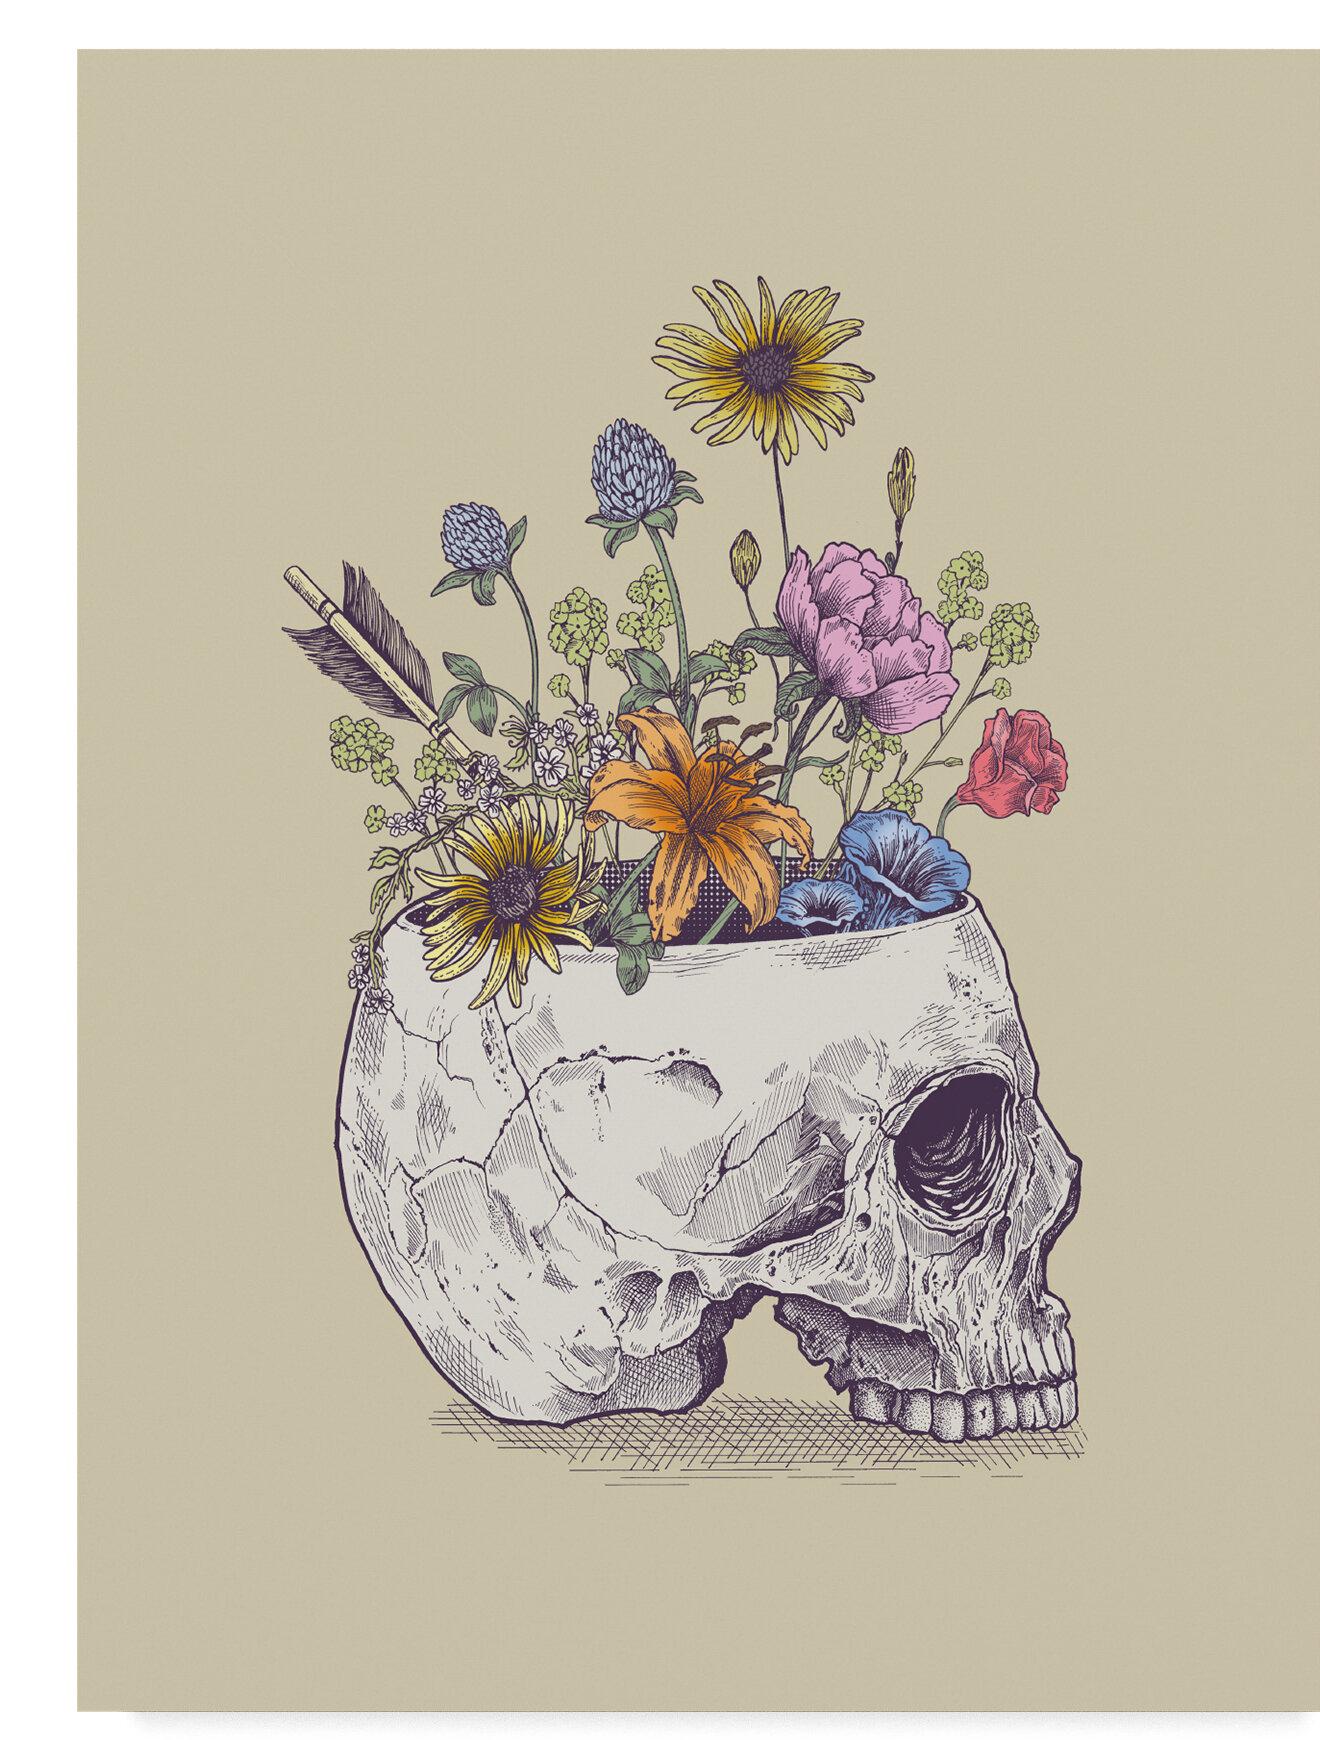 Ebern Designs Half Skull Flowers Graphic Art Print On Wrapped Canvas Wayfair